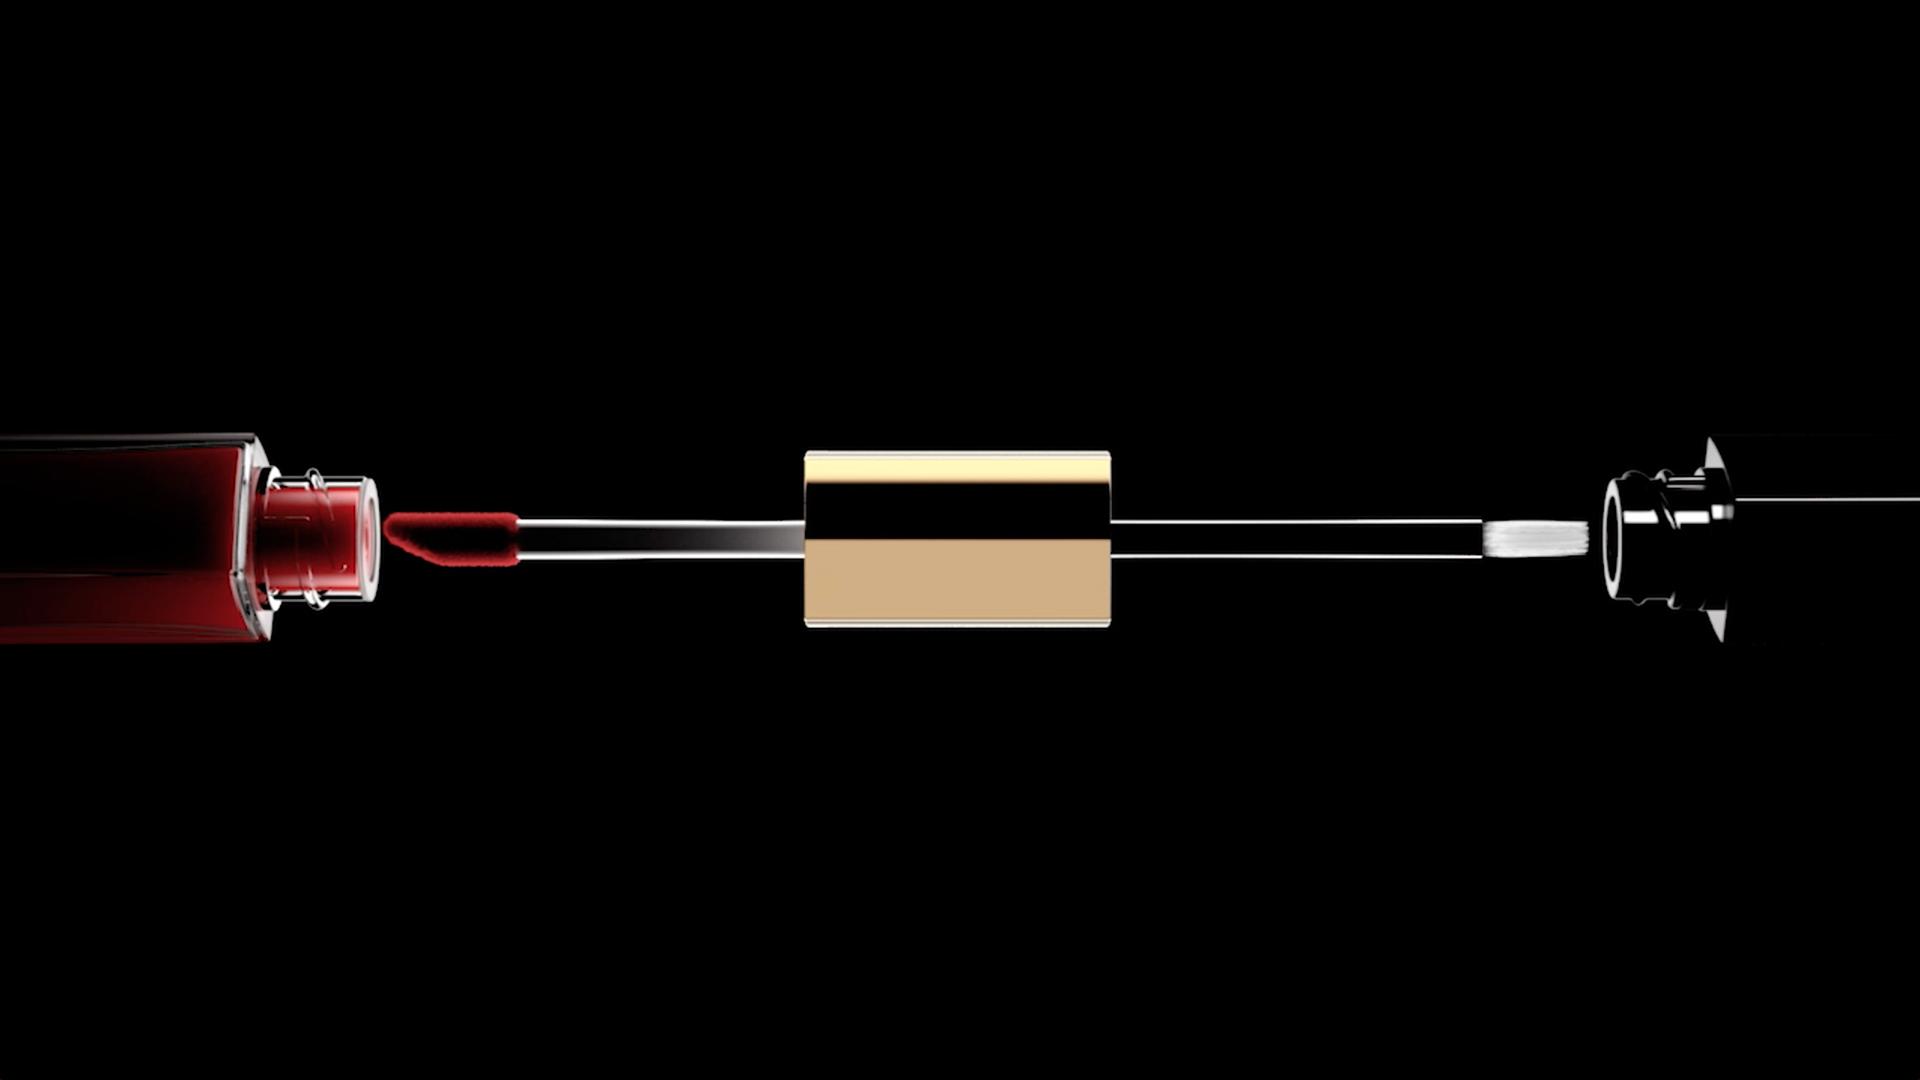 chanel.com - LE ROUGE DUO ULTRA TENUE Ultra Wear Lip Colour